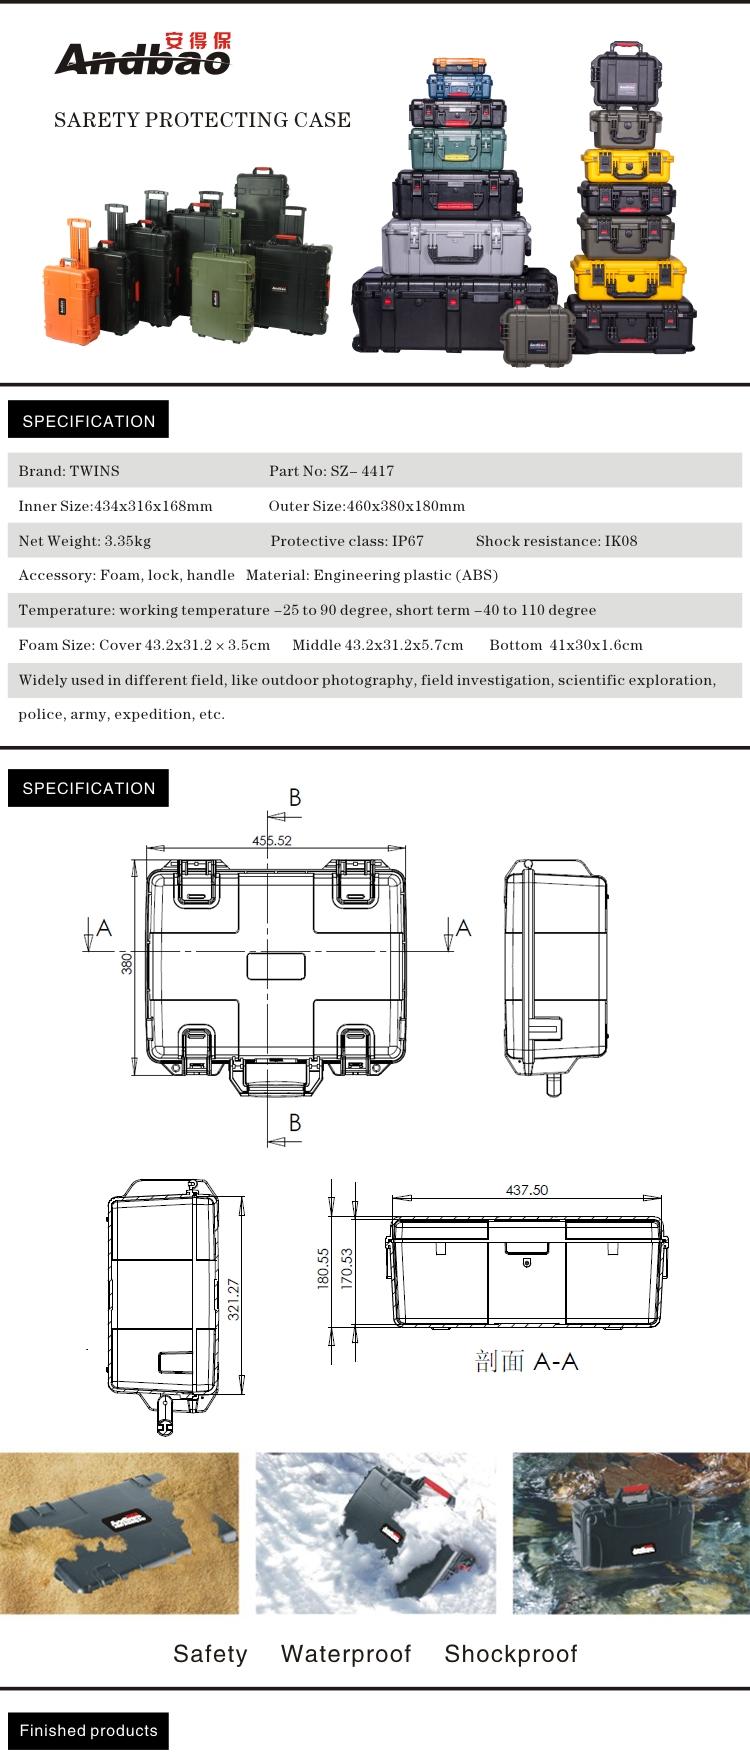 sz-4417-1